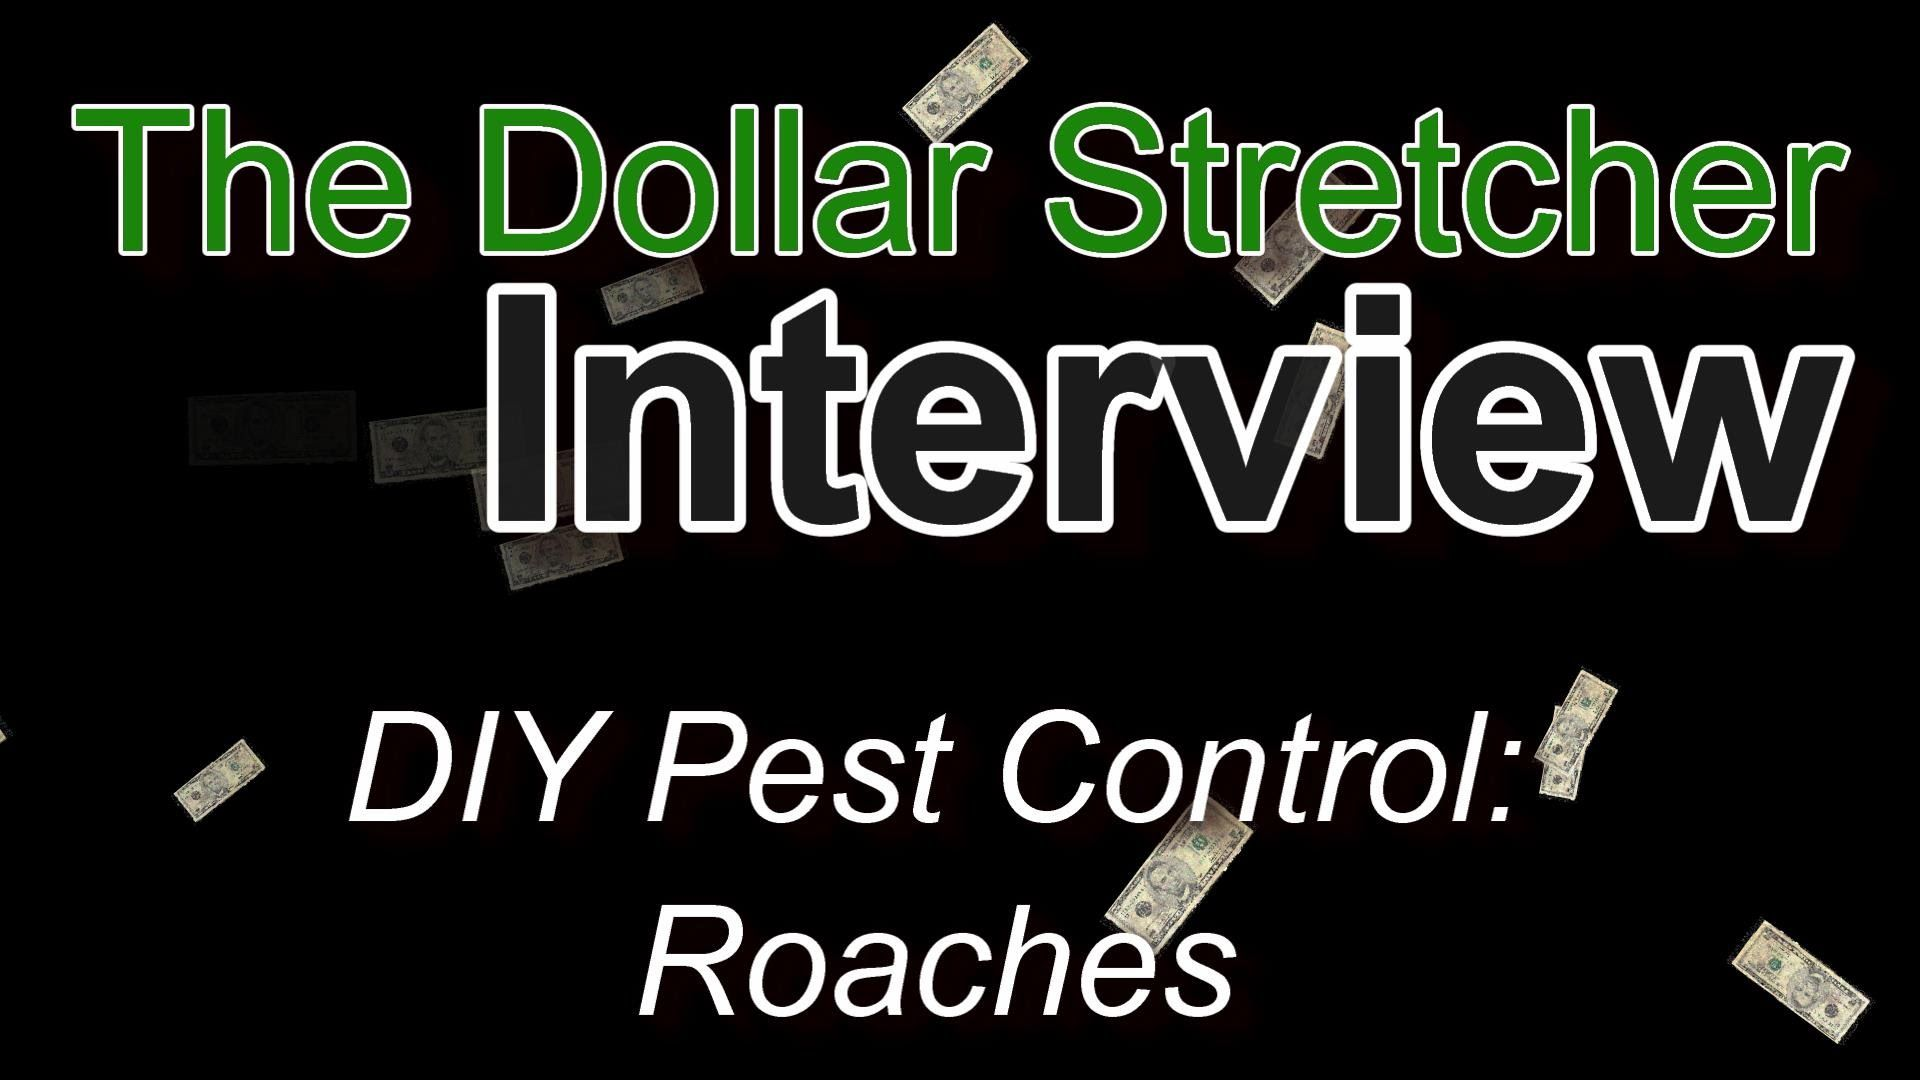 DIY Pest Control Roaches The Dollar Stretcher Diy